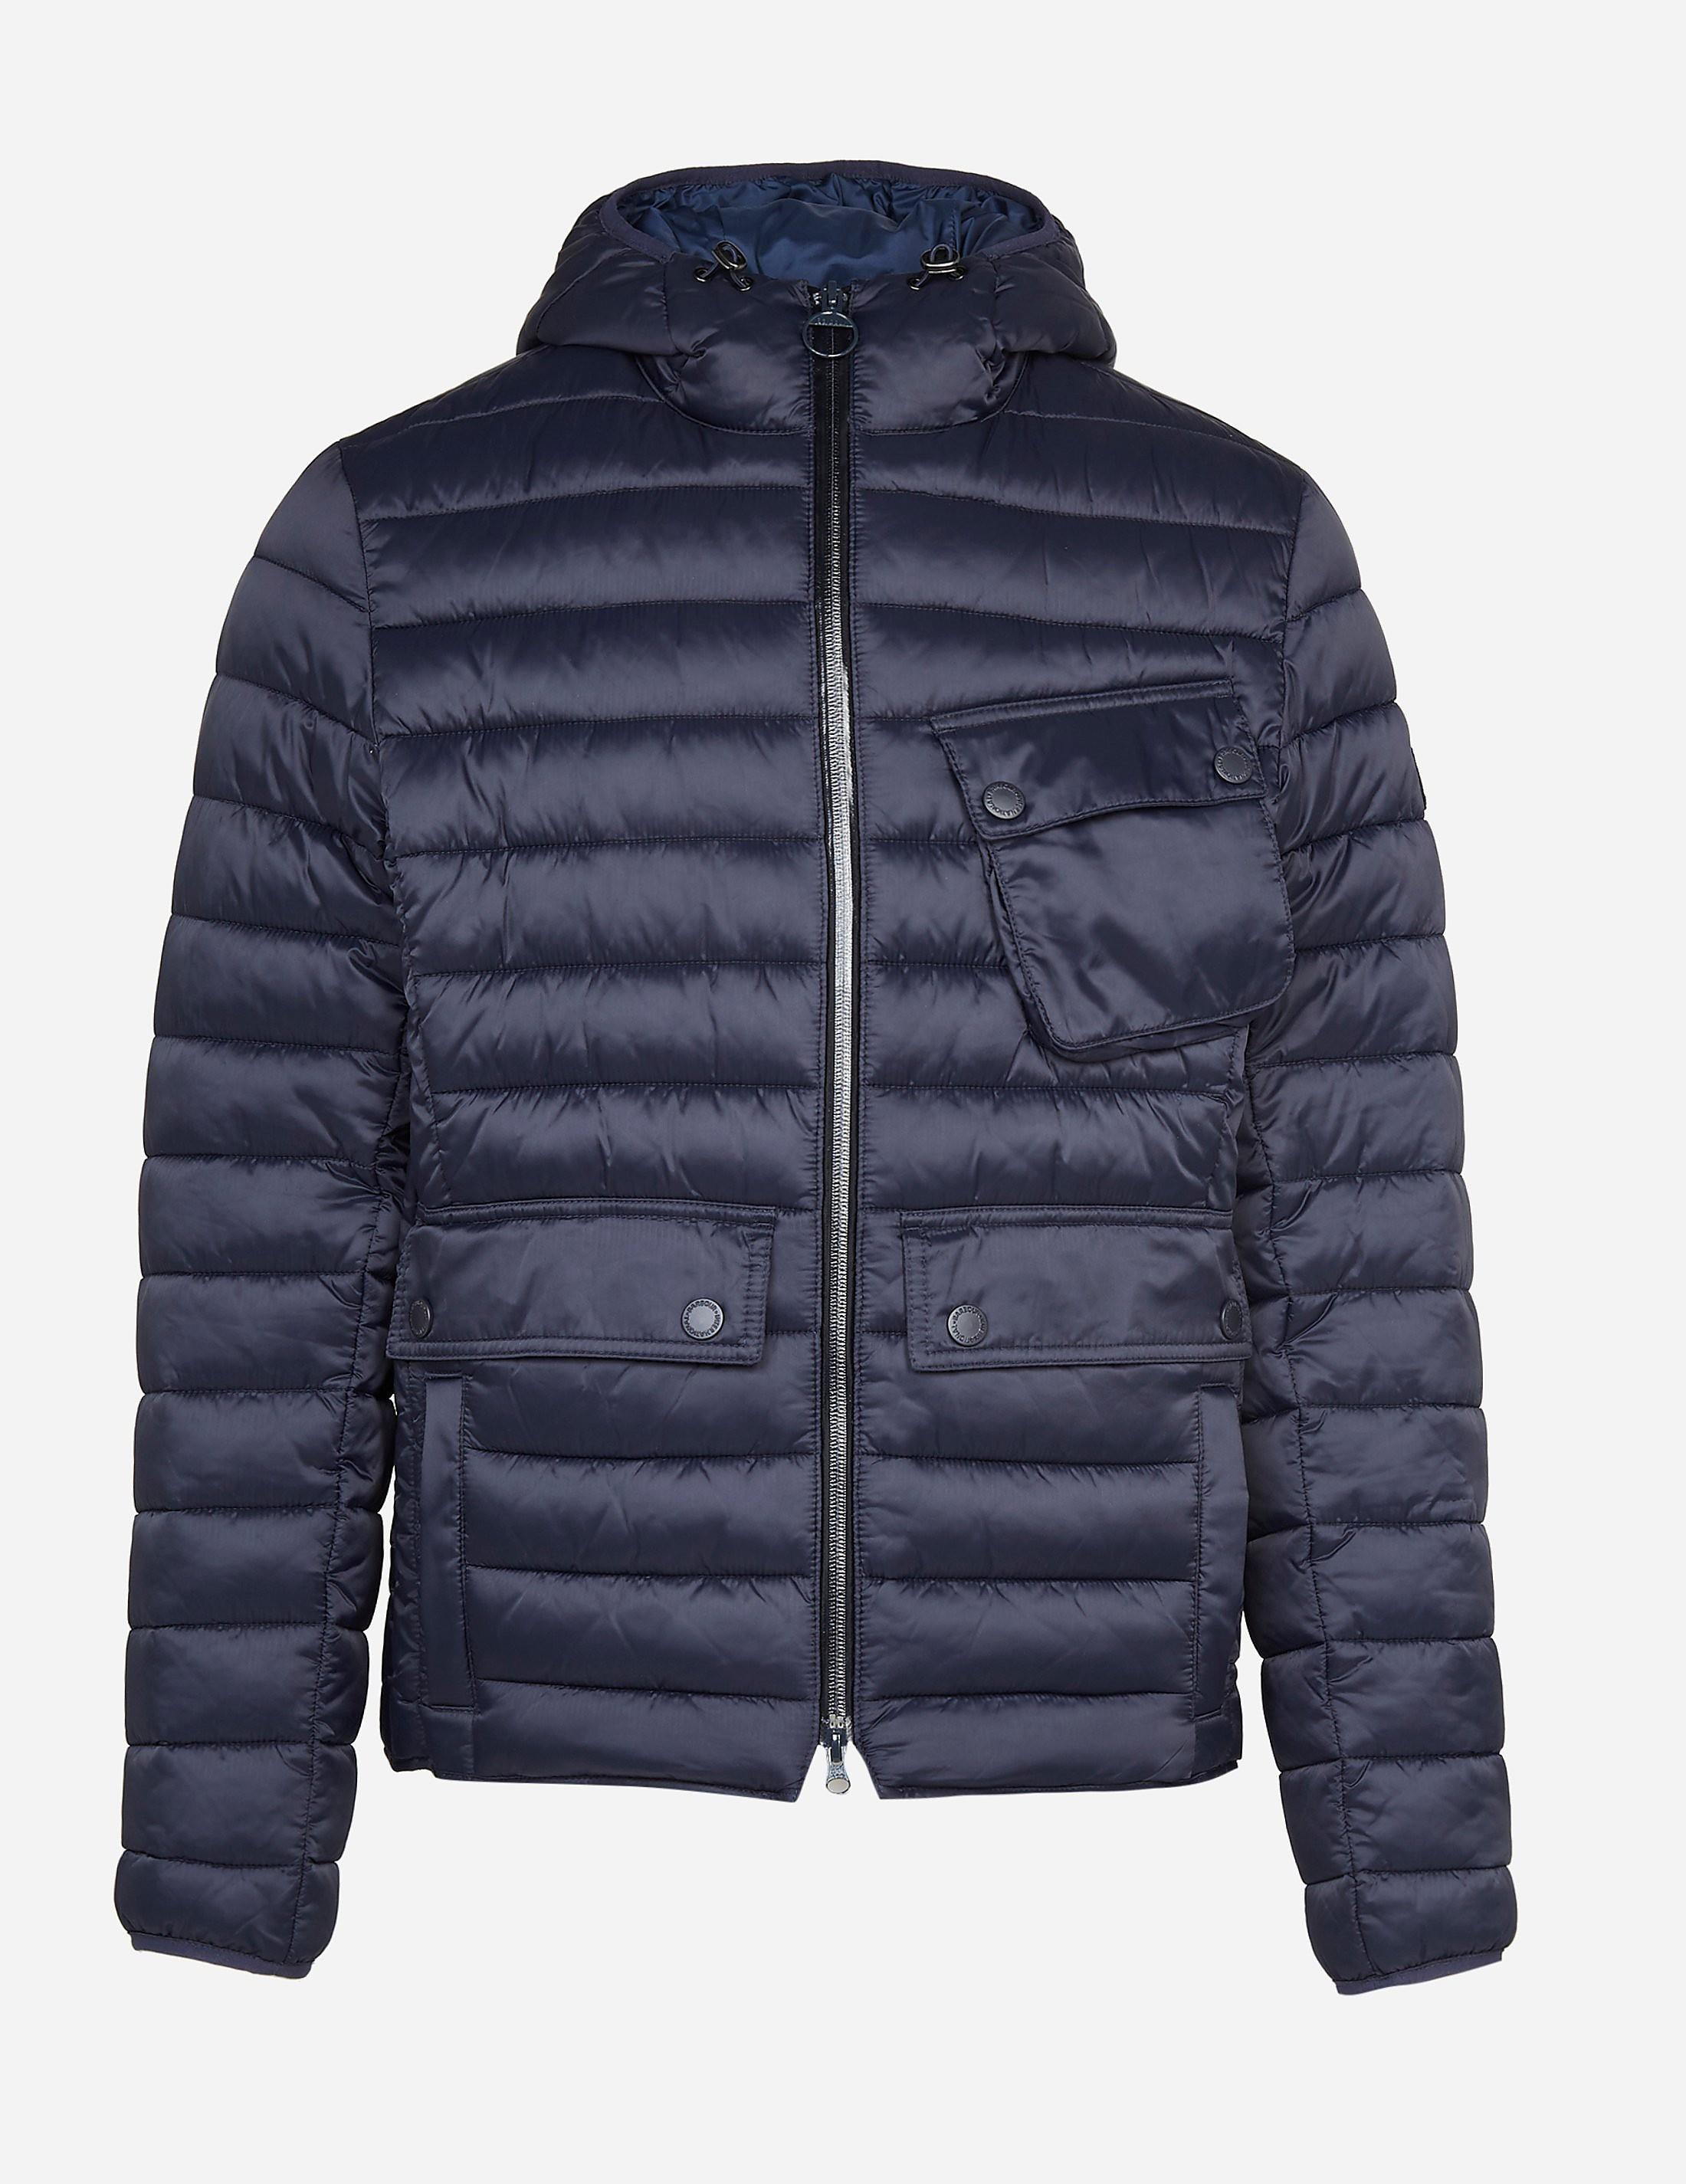 Barbour Ouston Hood Jacket